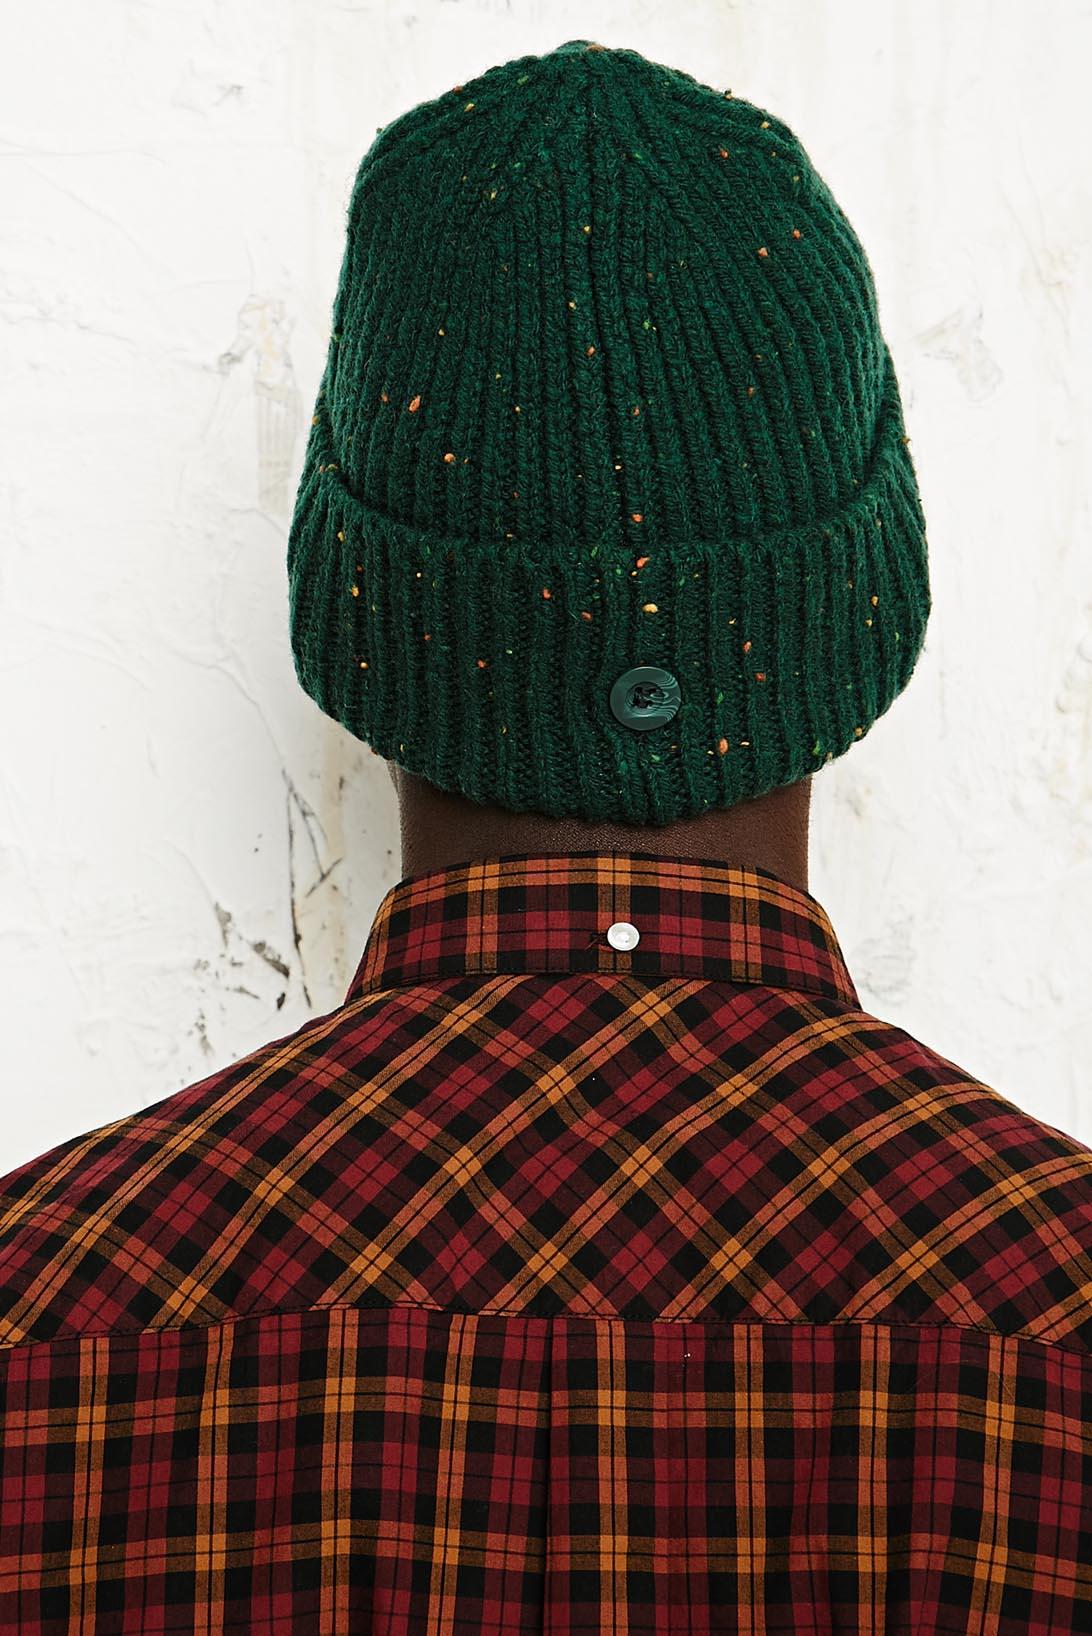 Carhartt Anglistic Beanie Hat in Green in Green for Men - Lyst daffc656f3f